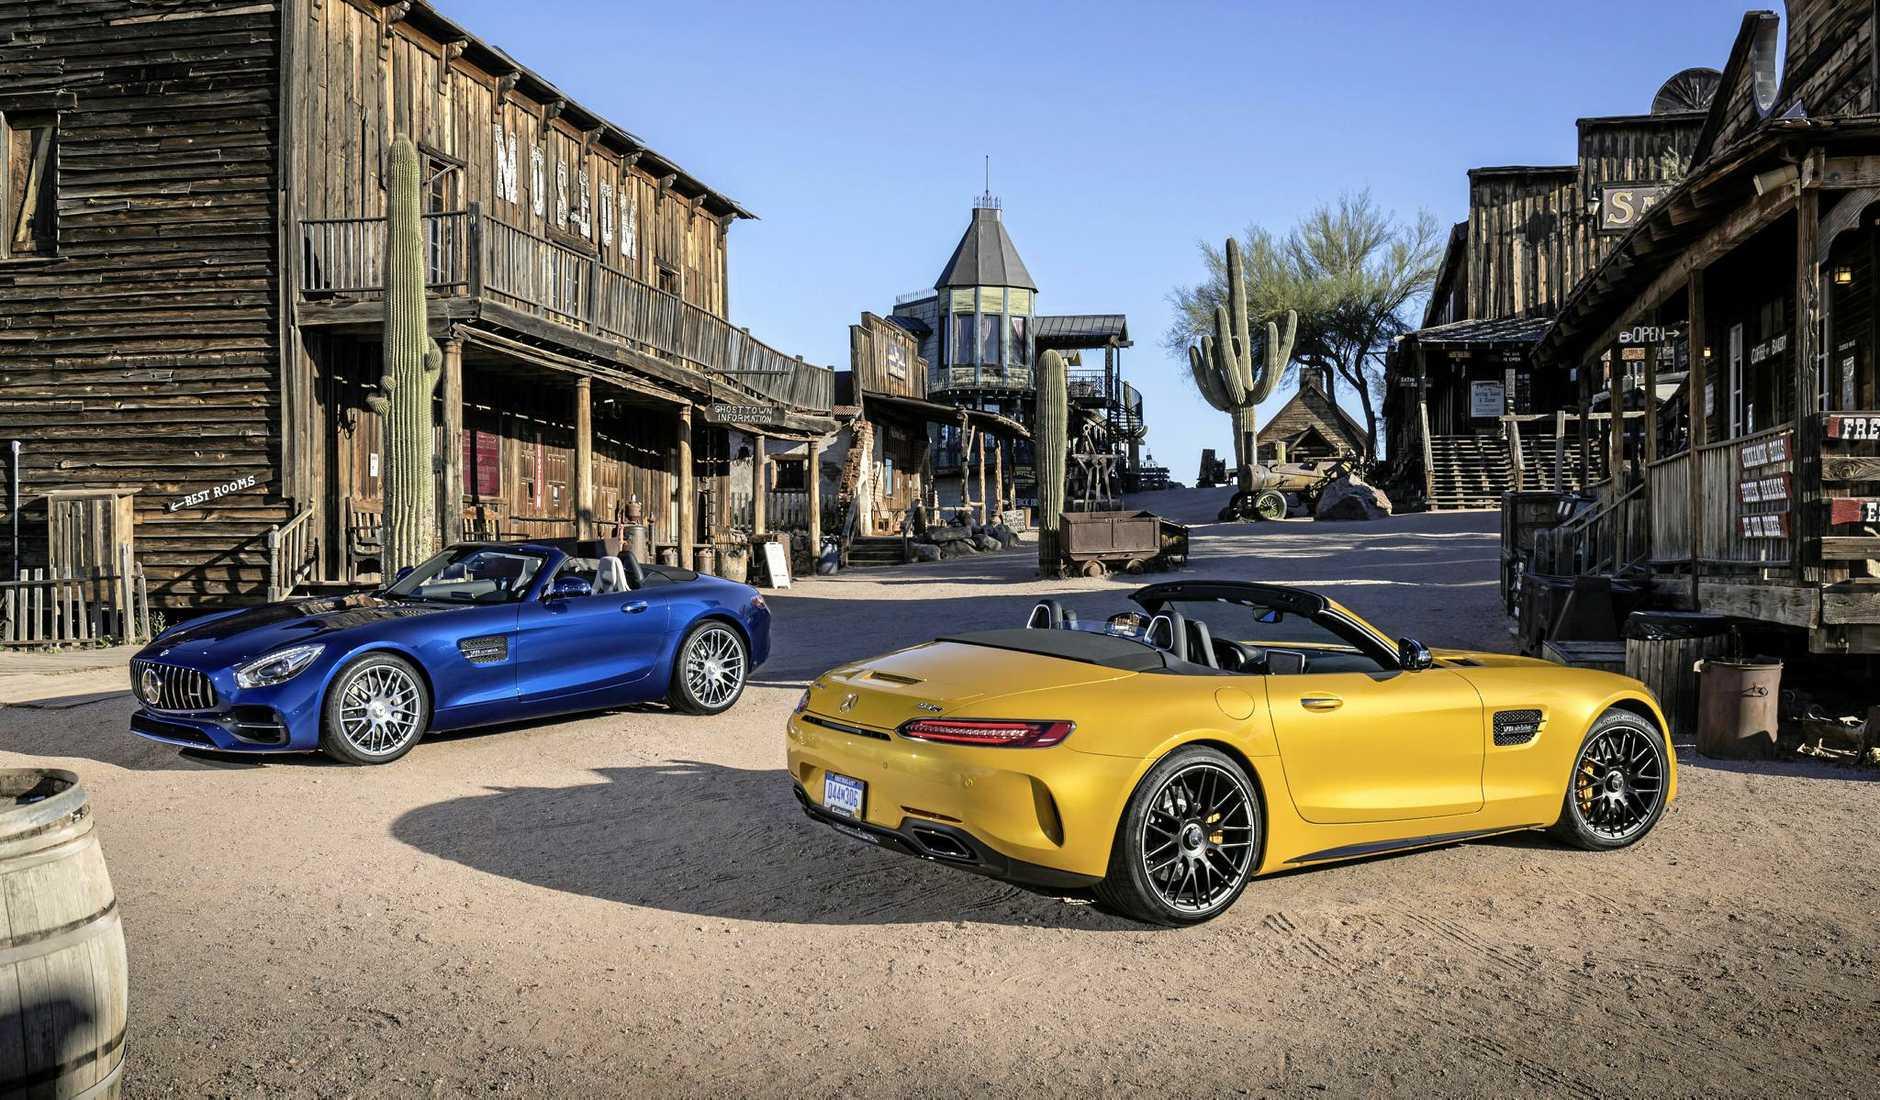 Mercedes-AMG GT C Roadster & Mercedes-AMG GT Roadster Fahrveranstaltung Phoenix 2017; Mercedes-AMG GT C Roadster: AMG solarbeam; Leder Exclusiv Nappa / Microfaser DINAMICA schwarz / graue Ziernhte; Mercedes-AMG GT Roadster: brillantblau metalic; Leder Exclusiv Nappa STYLE macchiatobeige/schwarz;Kraftstoffverbrauch kombiniert: 11,4  9,4 l/100 km; CO2-Emissionen kombiniert: 259 - 219 g/km*Mercedes-AMG GT C Roadster & Mercedes-AMG GT Roadster Press Test Drive Phoenix 2017; Mercedes-AMG GT C Roadster: AMG solarbeam; Exclusive Nappa leather / DINAMICA microfibre black / grey topstiching; Mercedes-AMG GT Roadster: brilliant blue metallic; STYLE Exclusive nappa leather macchiato beige/black;Fuel consumption combined: 11.4  9.4 l/100 km; Combined CO2 emissions: 259 - 219 g/km*